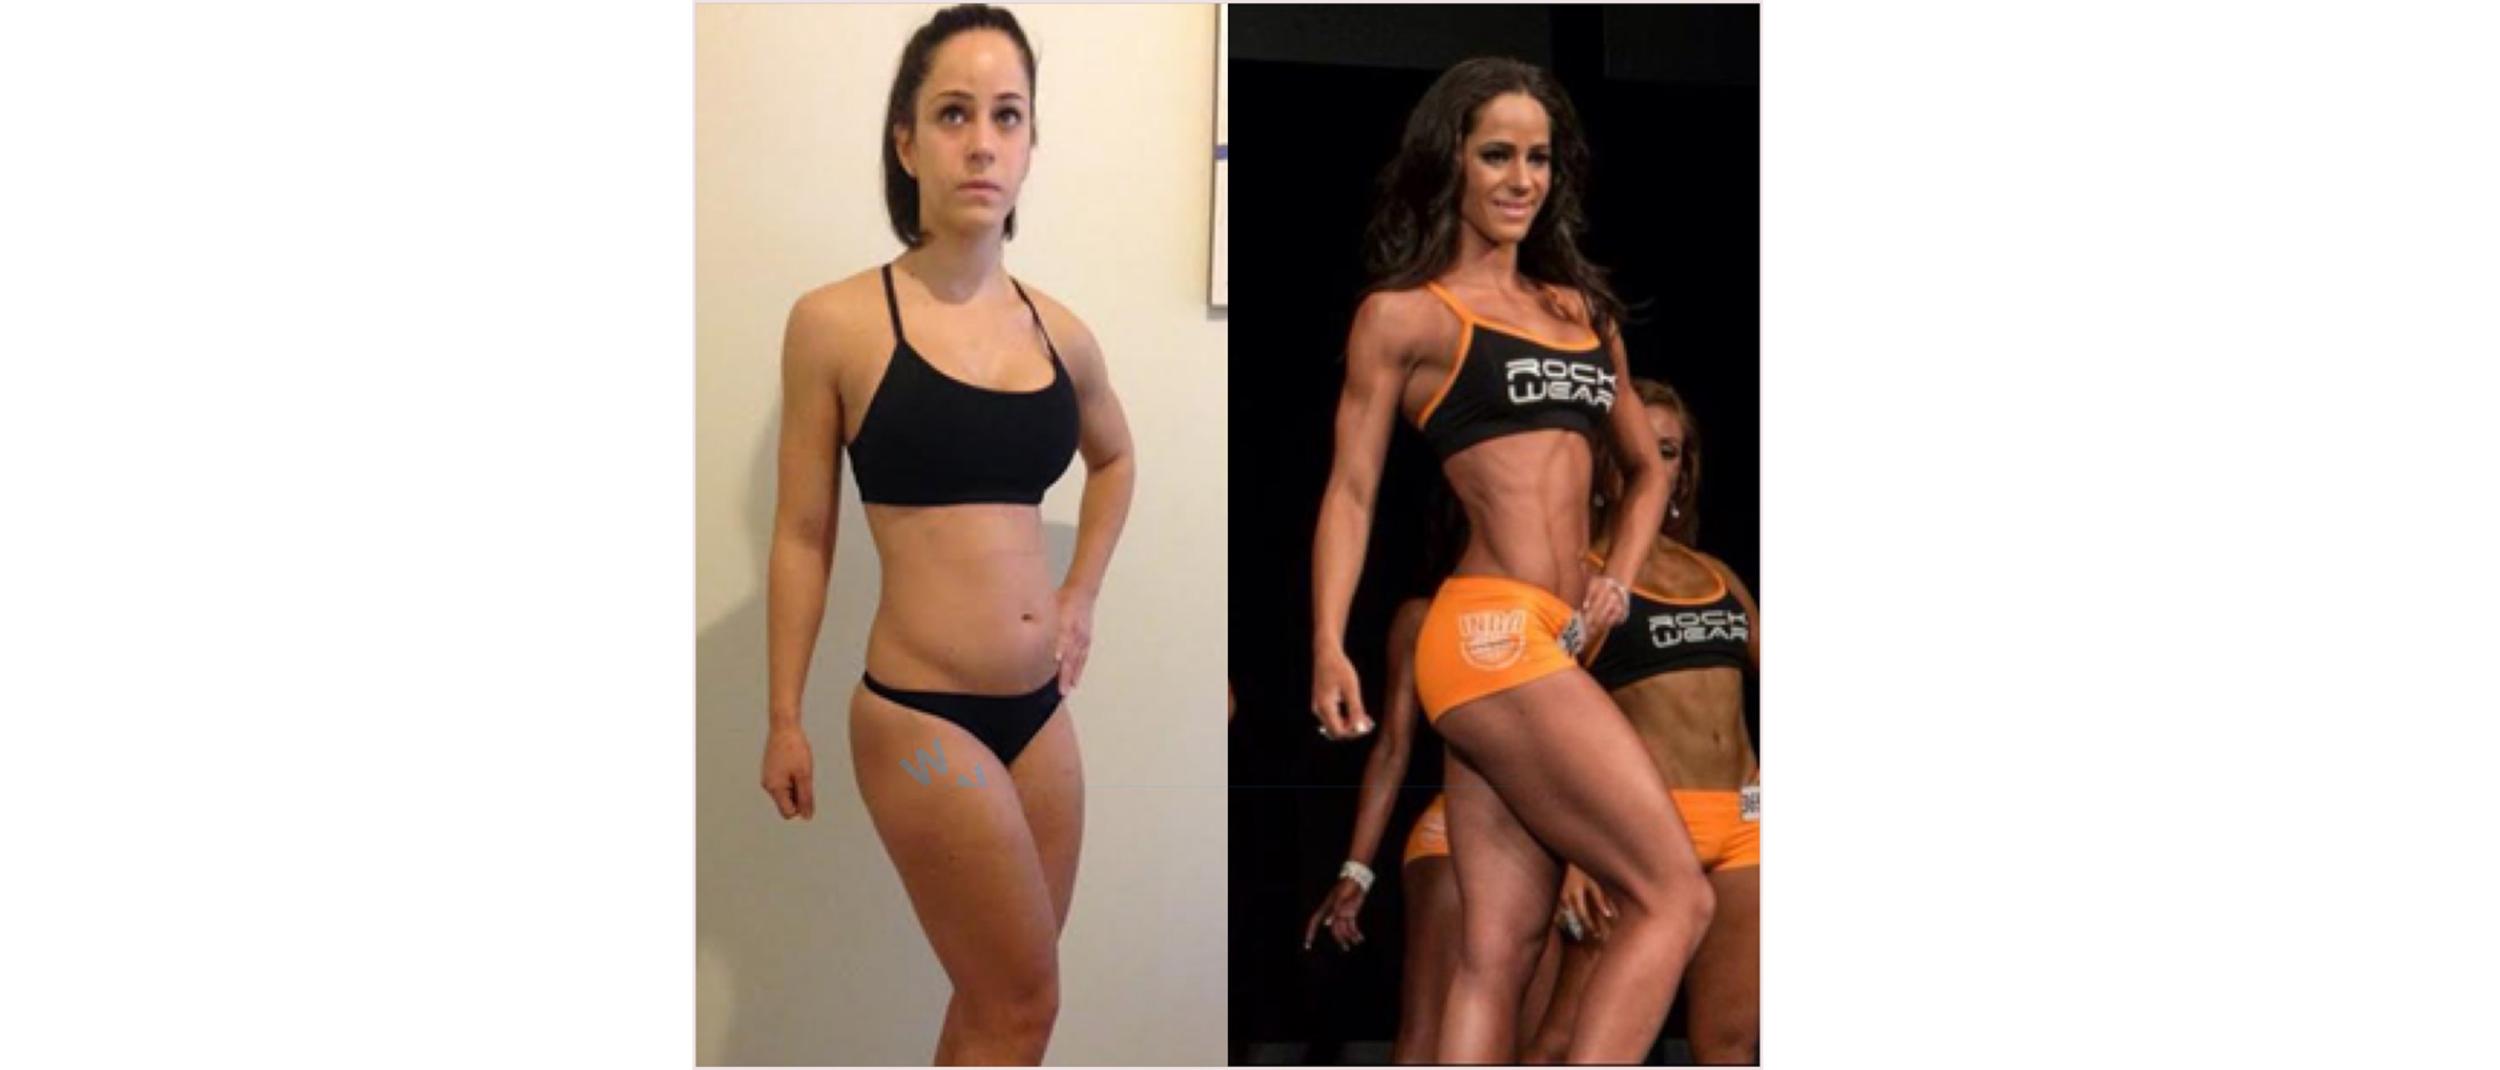 Rachel's Transformation. Photos by Nicky Jankovic